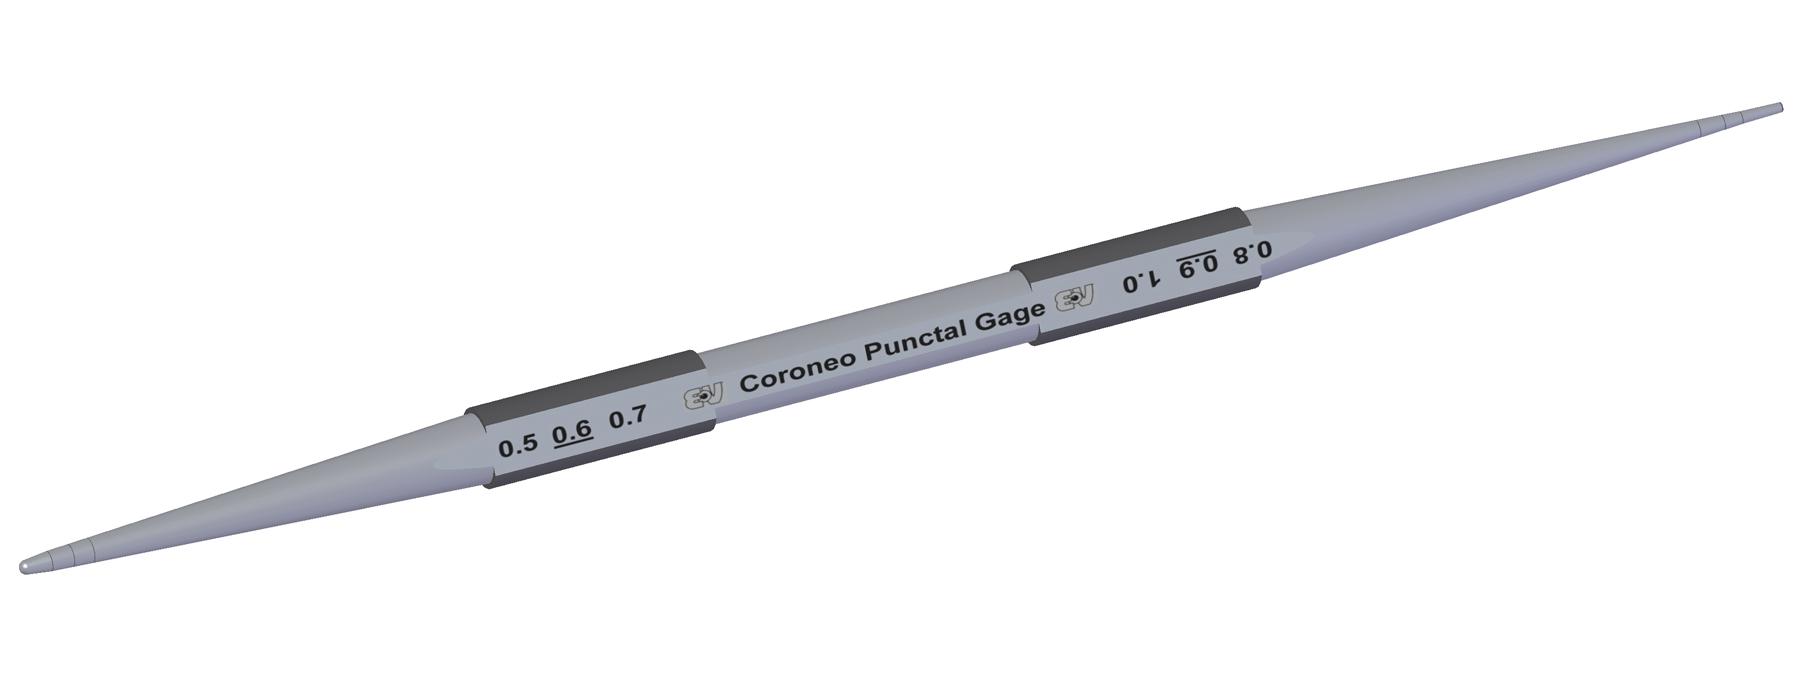 Coroneo Punctal Gauge